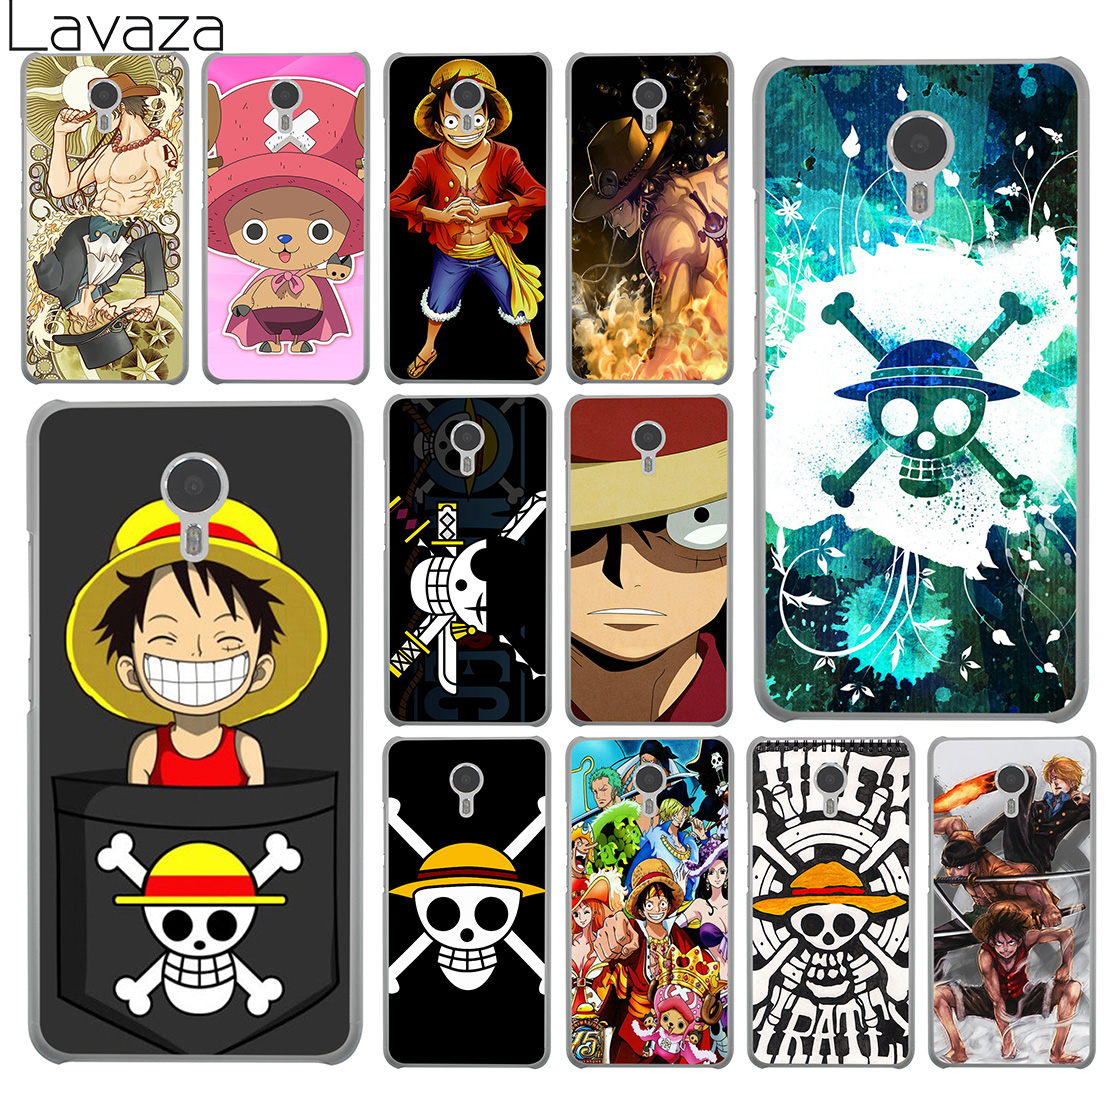 Lavaza One Piece Luffy Anime Hard Phone Case for Meizu M6 M5 M5C M5S M3 M3S M2 Mini Note U10 U20 Pro 7 Plus 6 Cover